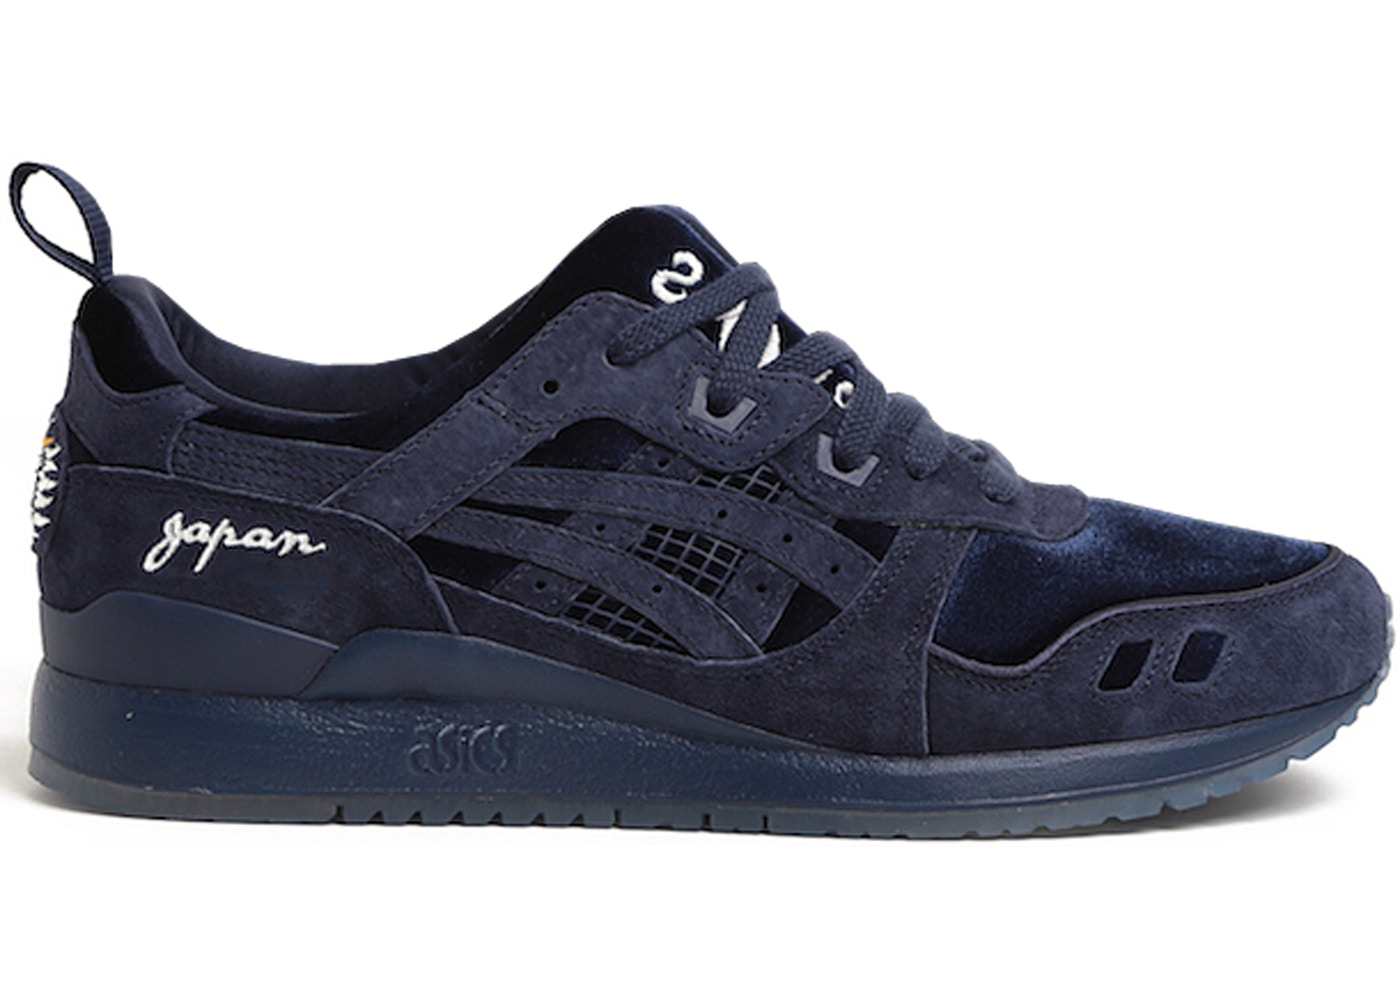 909e54865d17 Asics Size 6 Shoes - Price Premium